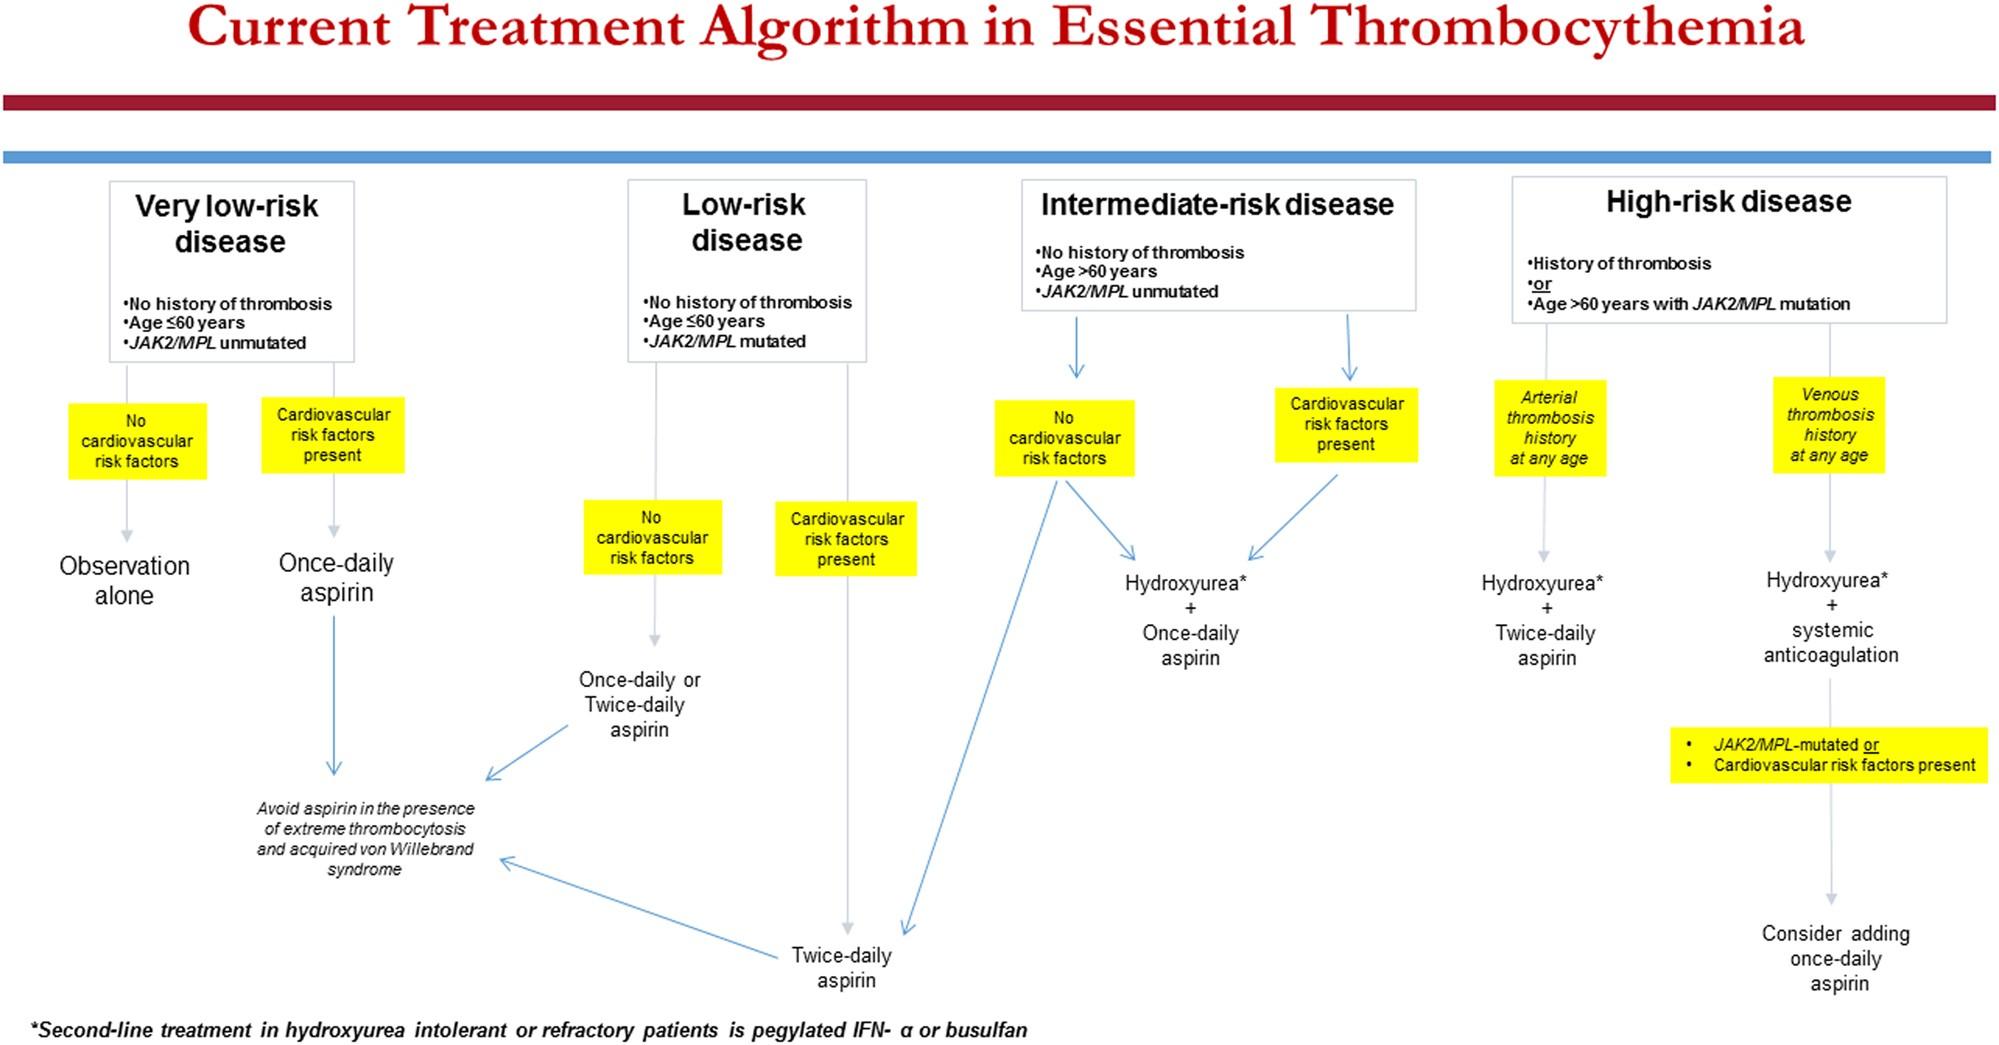 Essential thrombocythemia treatment algorithm 2018 | Blood